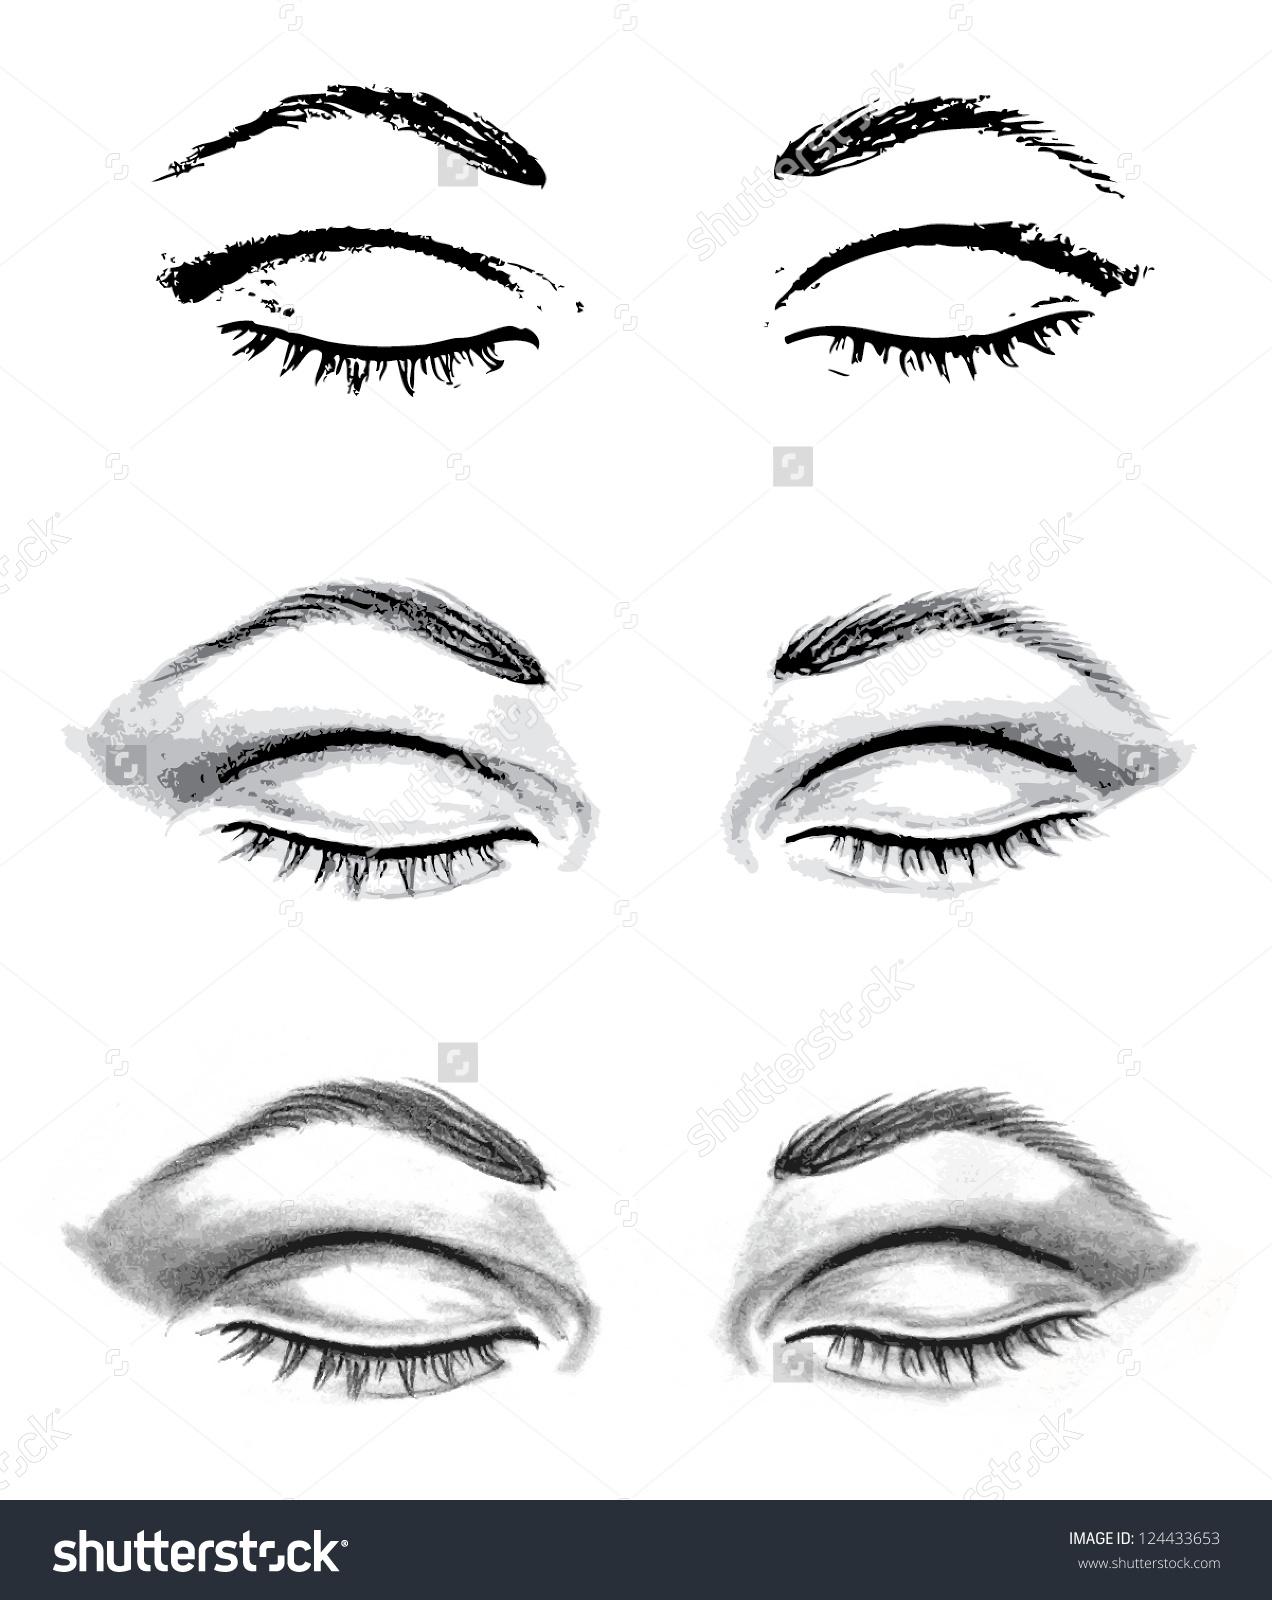 Drawn eye closed Closed Auto Eyes And Sketch